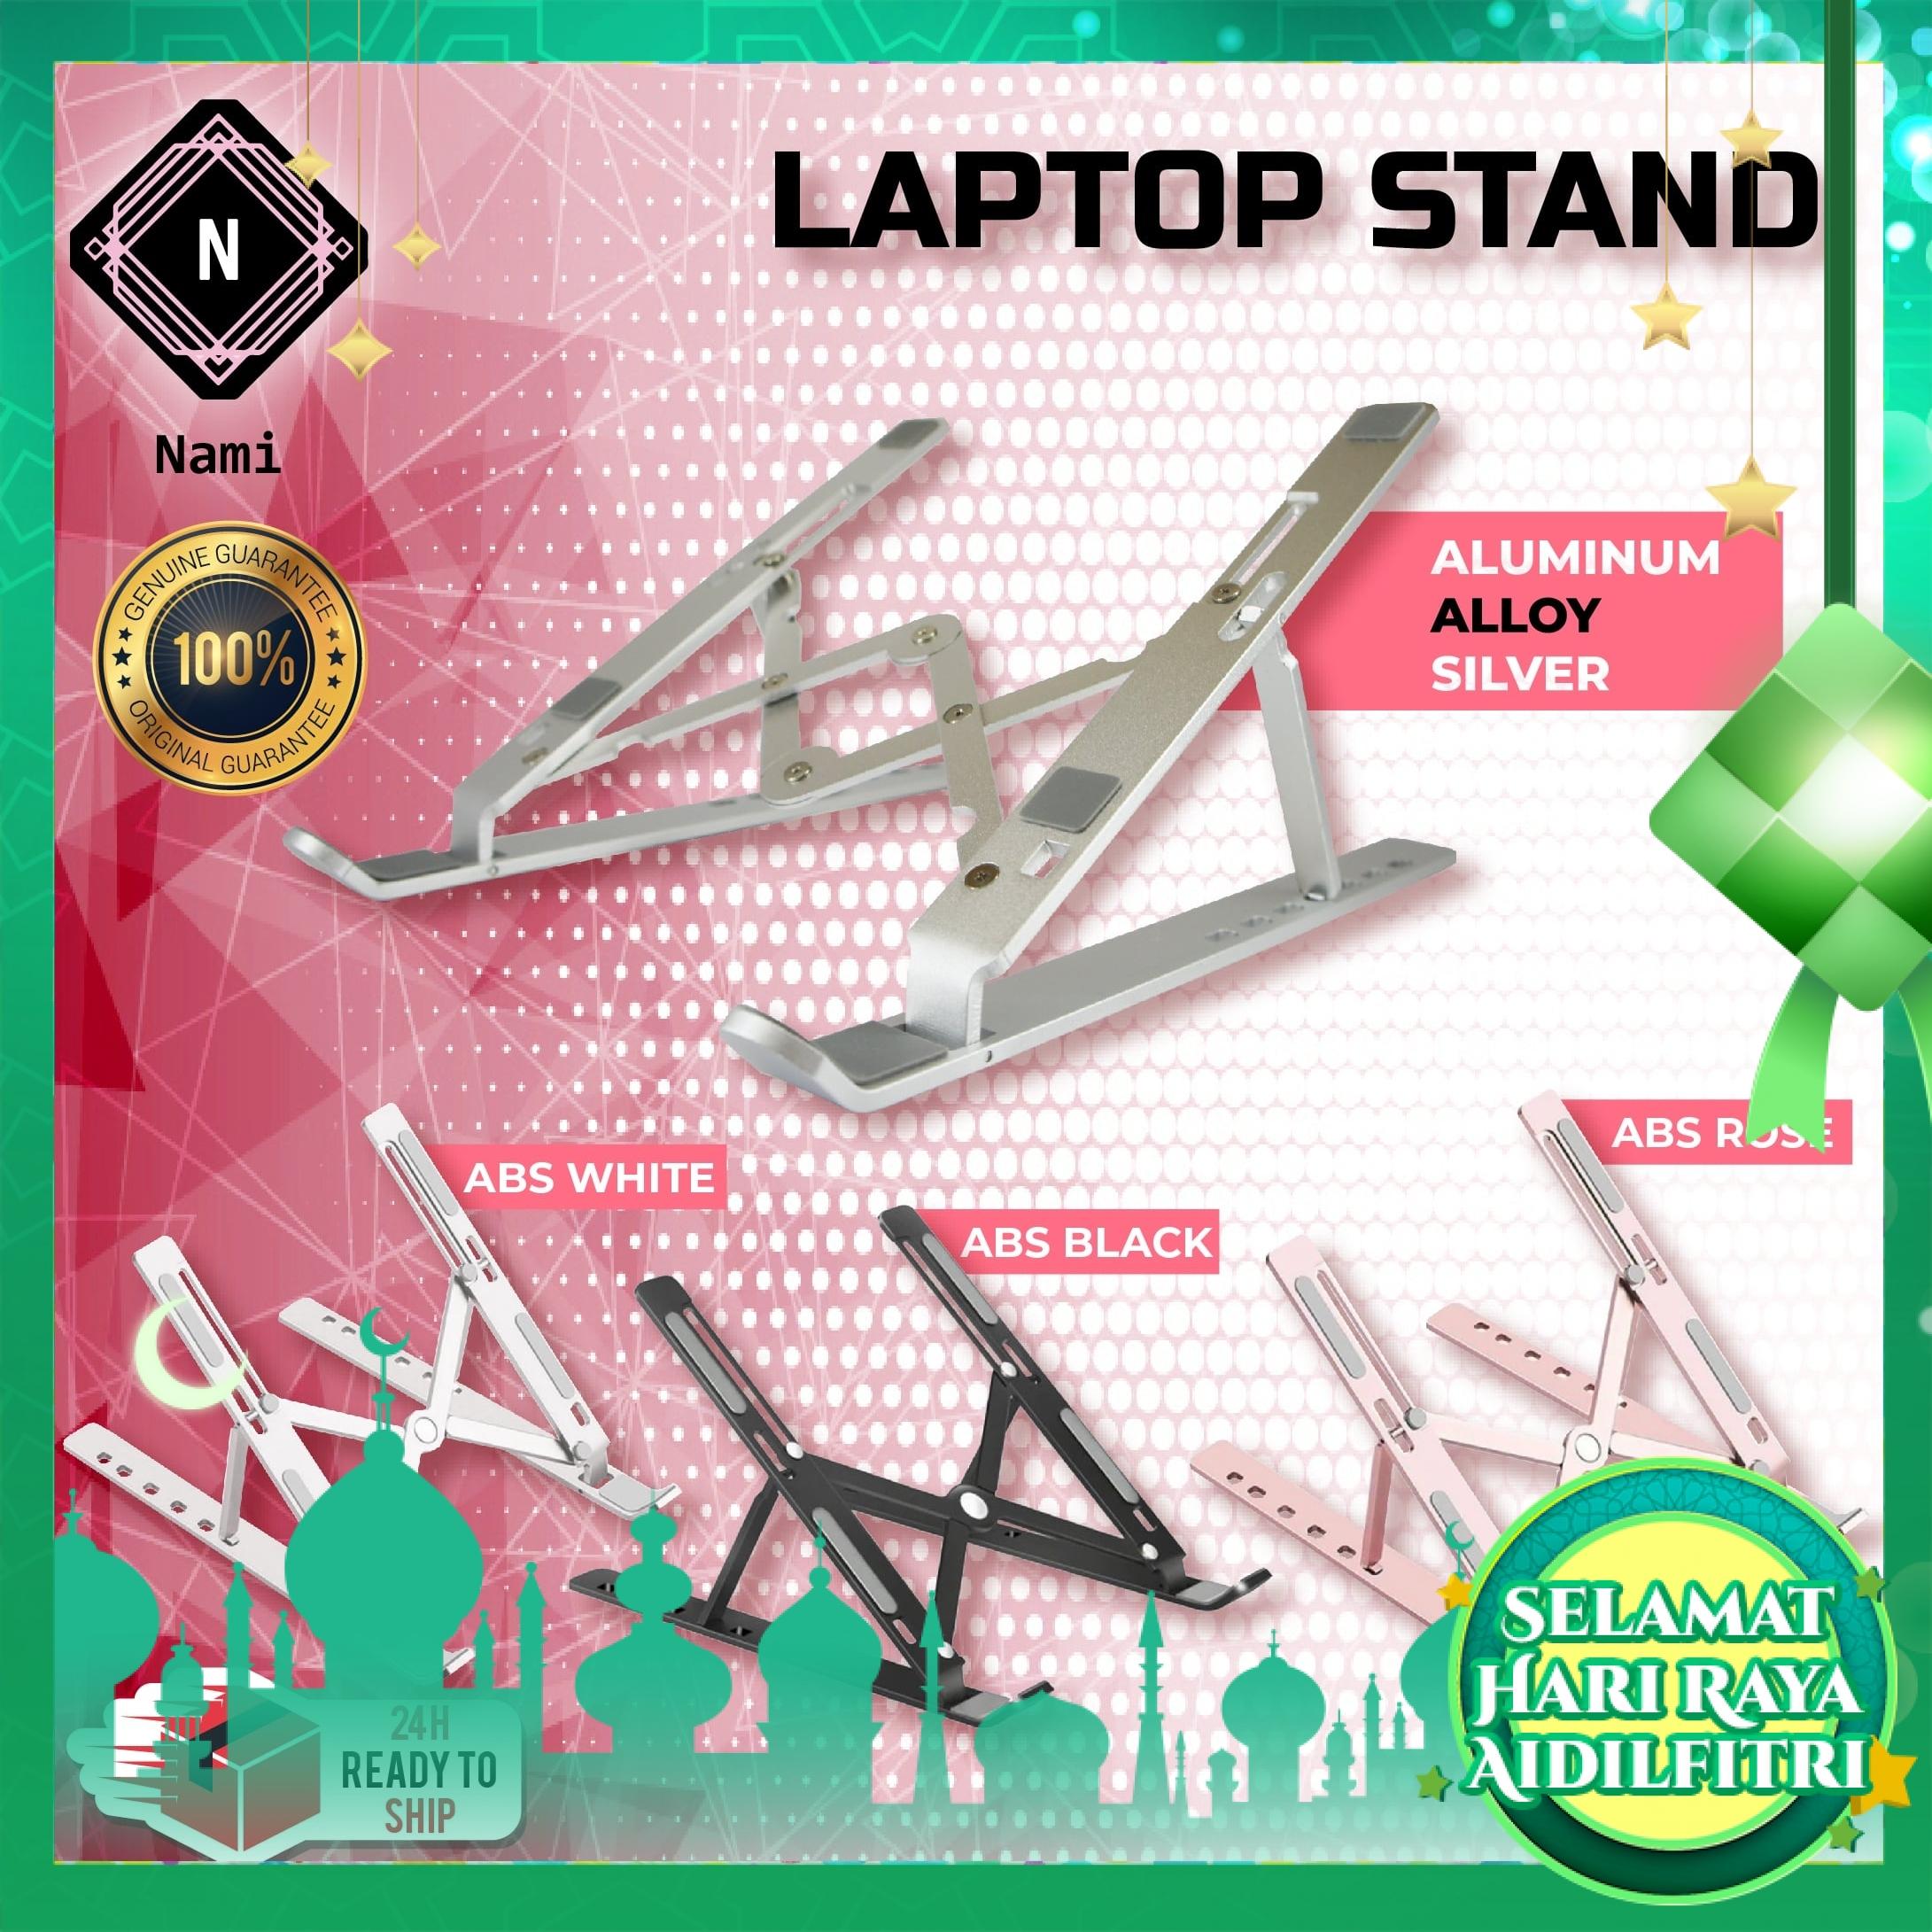 Laptop Stand Portable Platform Cooling Design Foldable Stand...